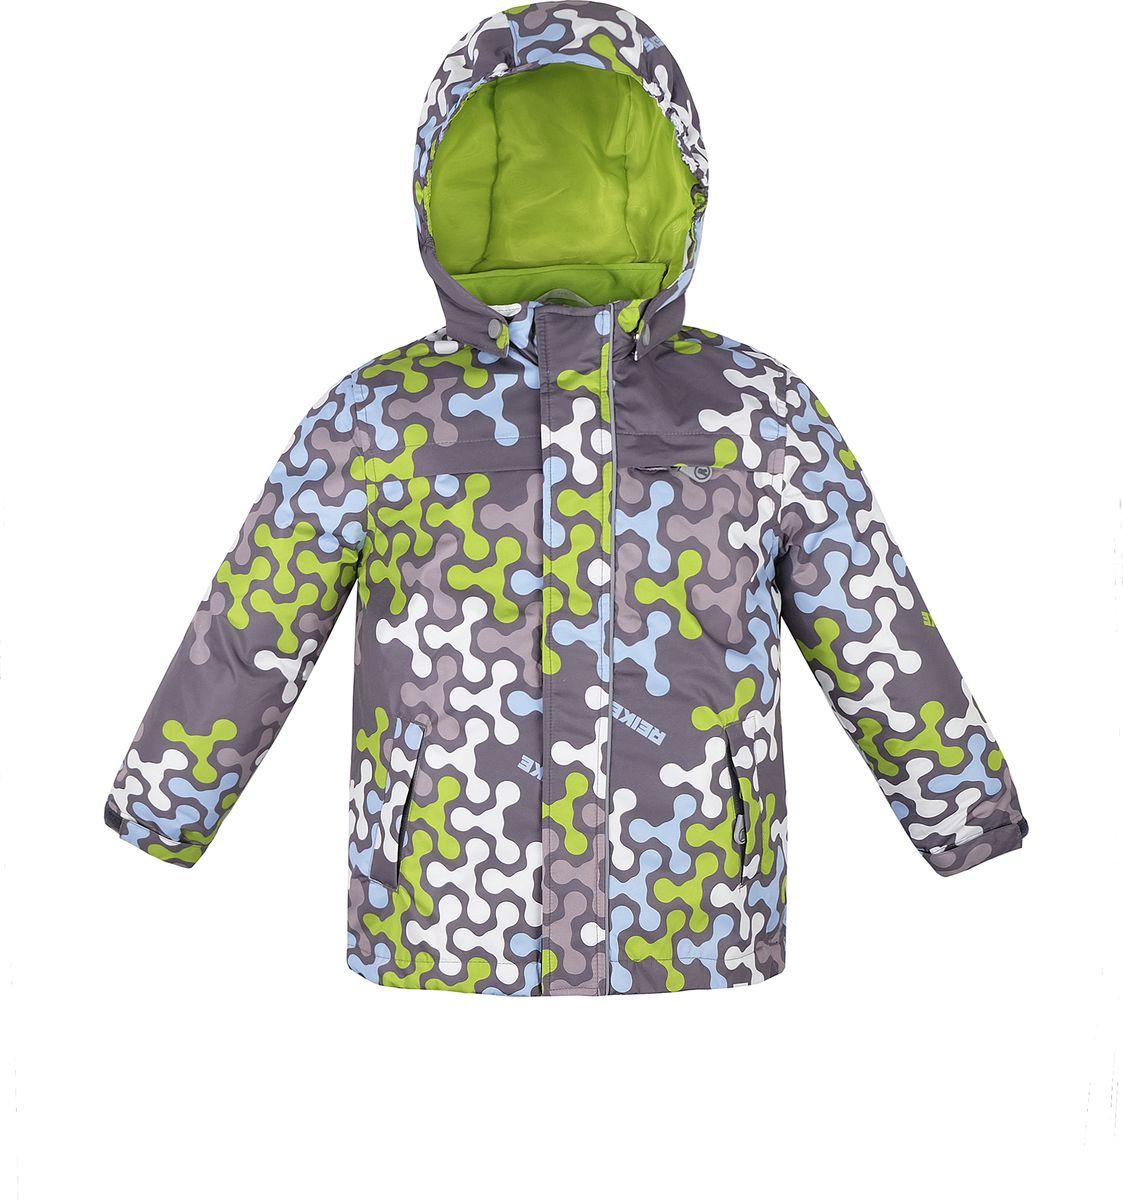 Куртка для мальчика Reike, цвет: серый. 40 895 115_SPN(60) grey. Размер 128, 8 лет40 895 115_SPN(60) grey